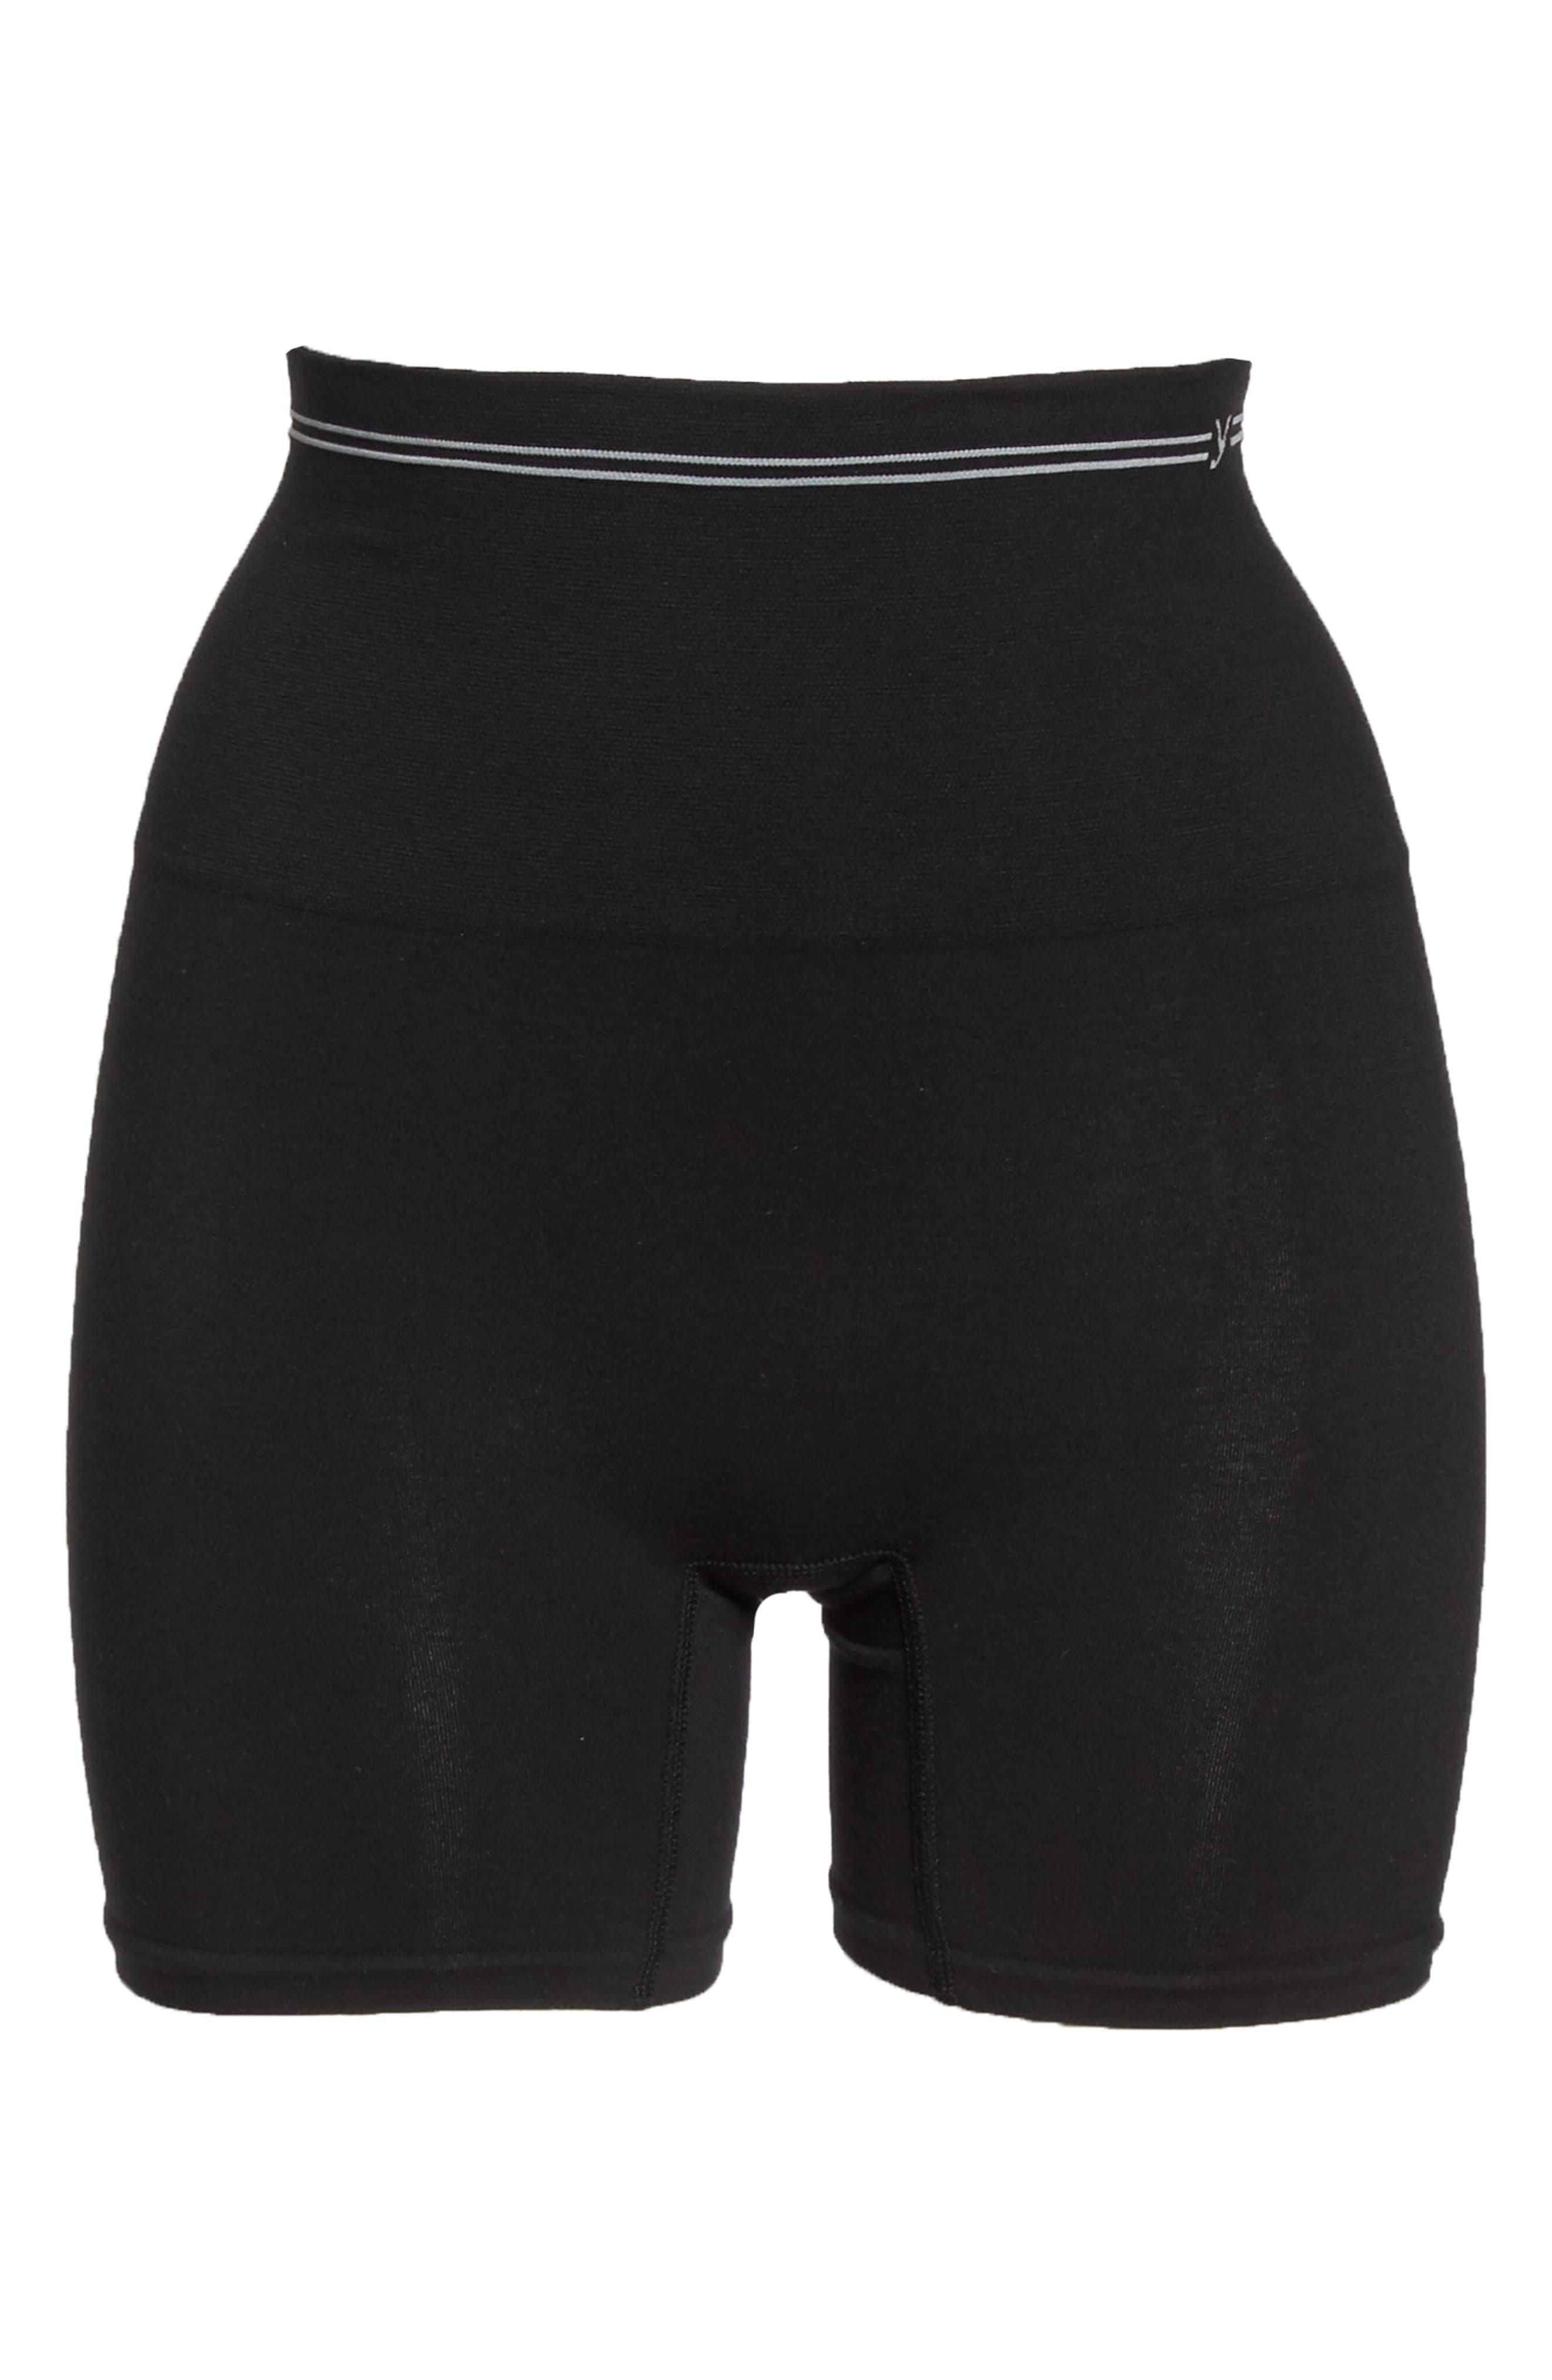 Seamless Shaping Shorts,                             Alternate thumbnail 6, color,                             001